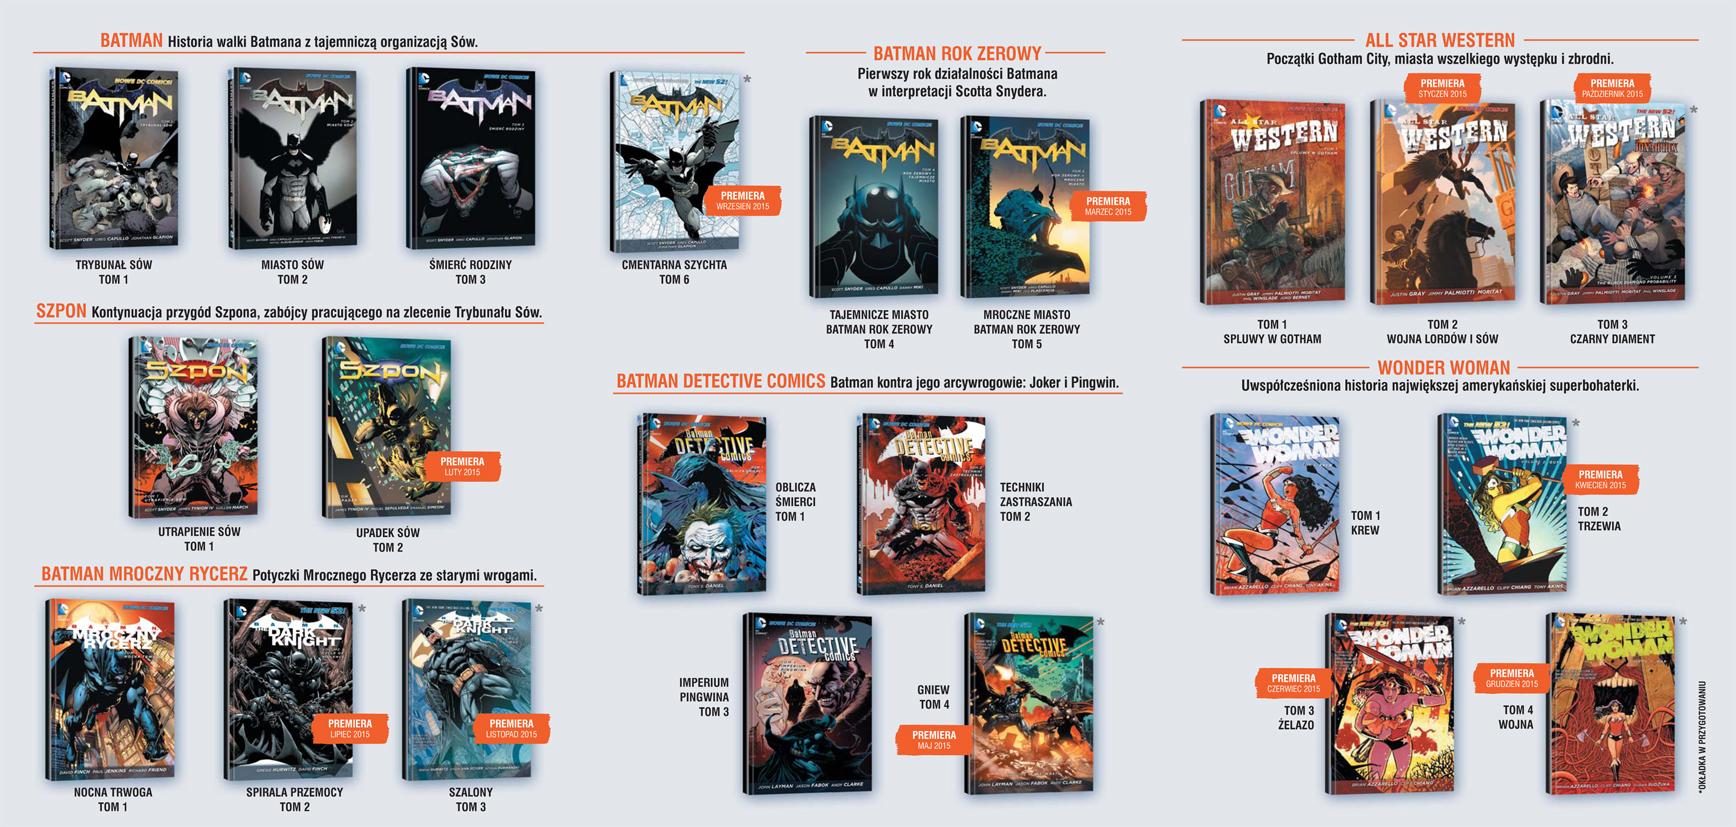 Nowe DC Comics oraz DC Deluxe - rozpiska na cały rok 2015!